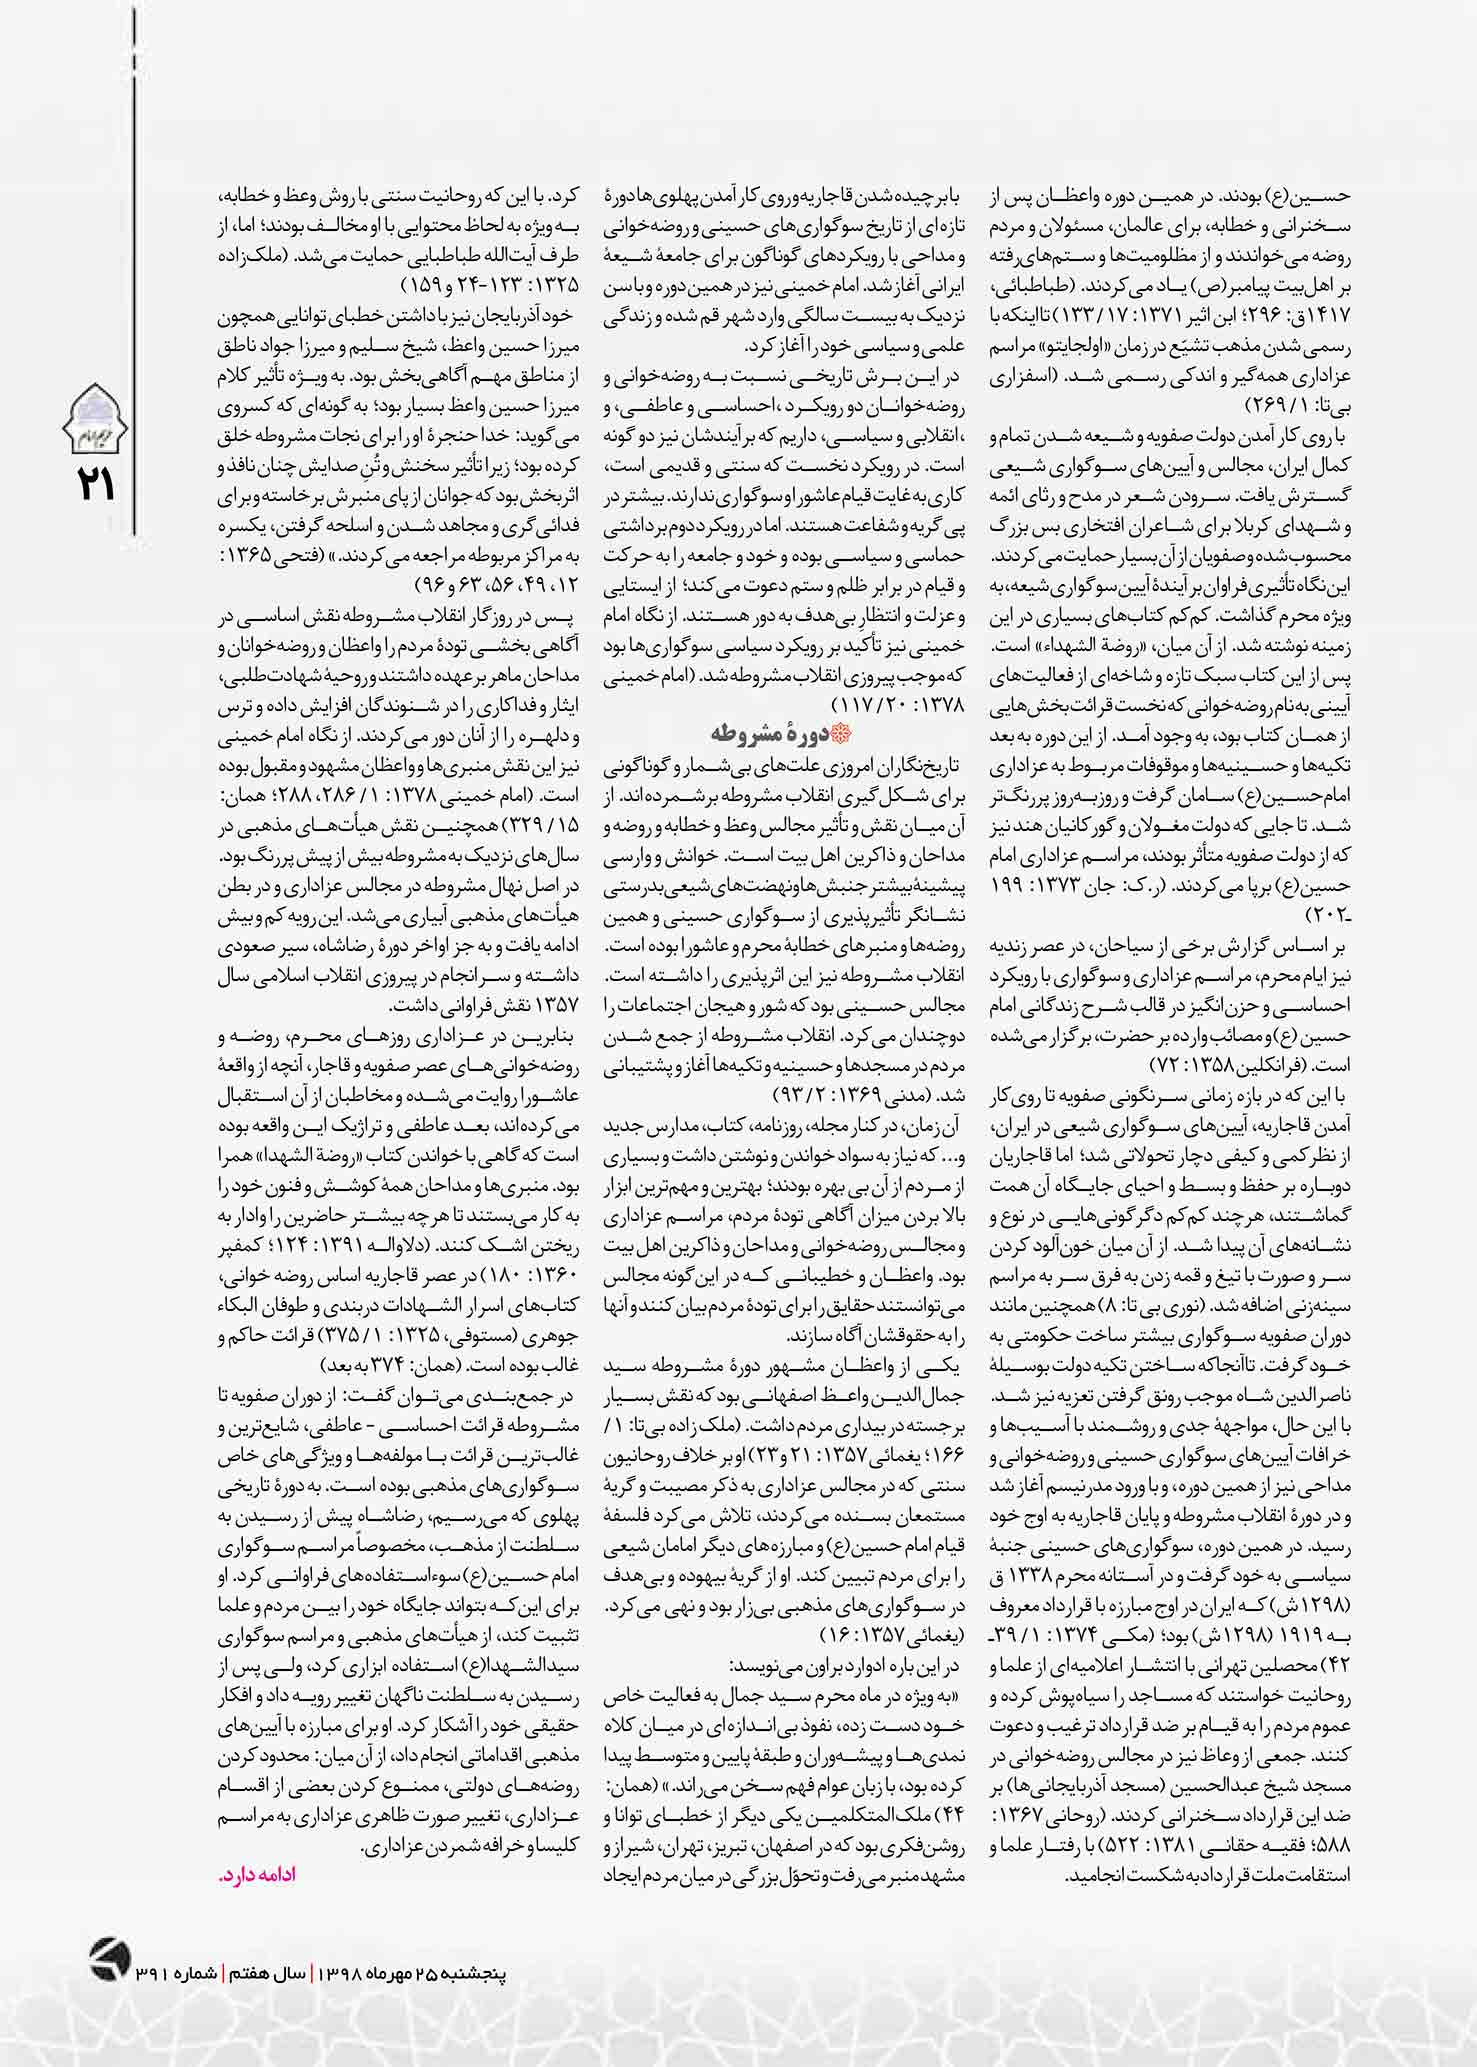 C:\Users\a.khalojini.ICPIKW\Desktop\391\New folder\@harim_emam391-21.jpg